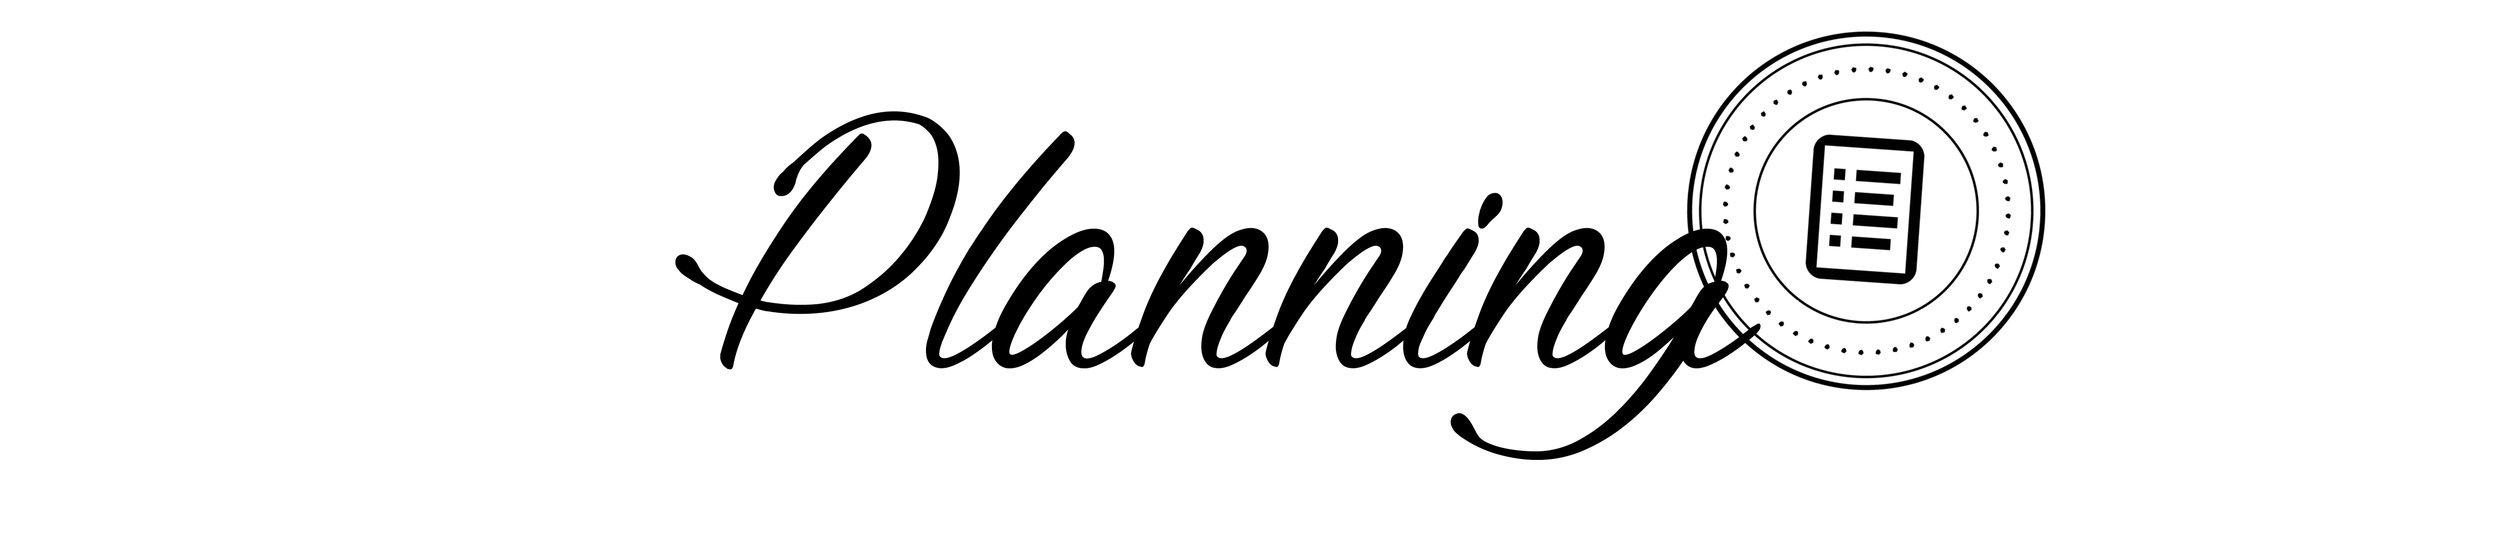 planning banner.jpg